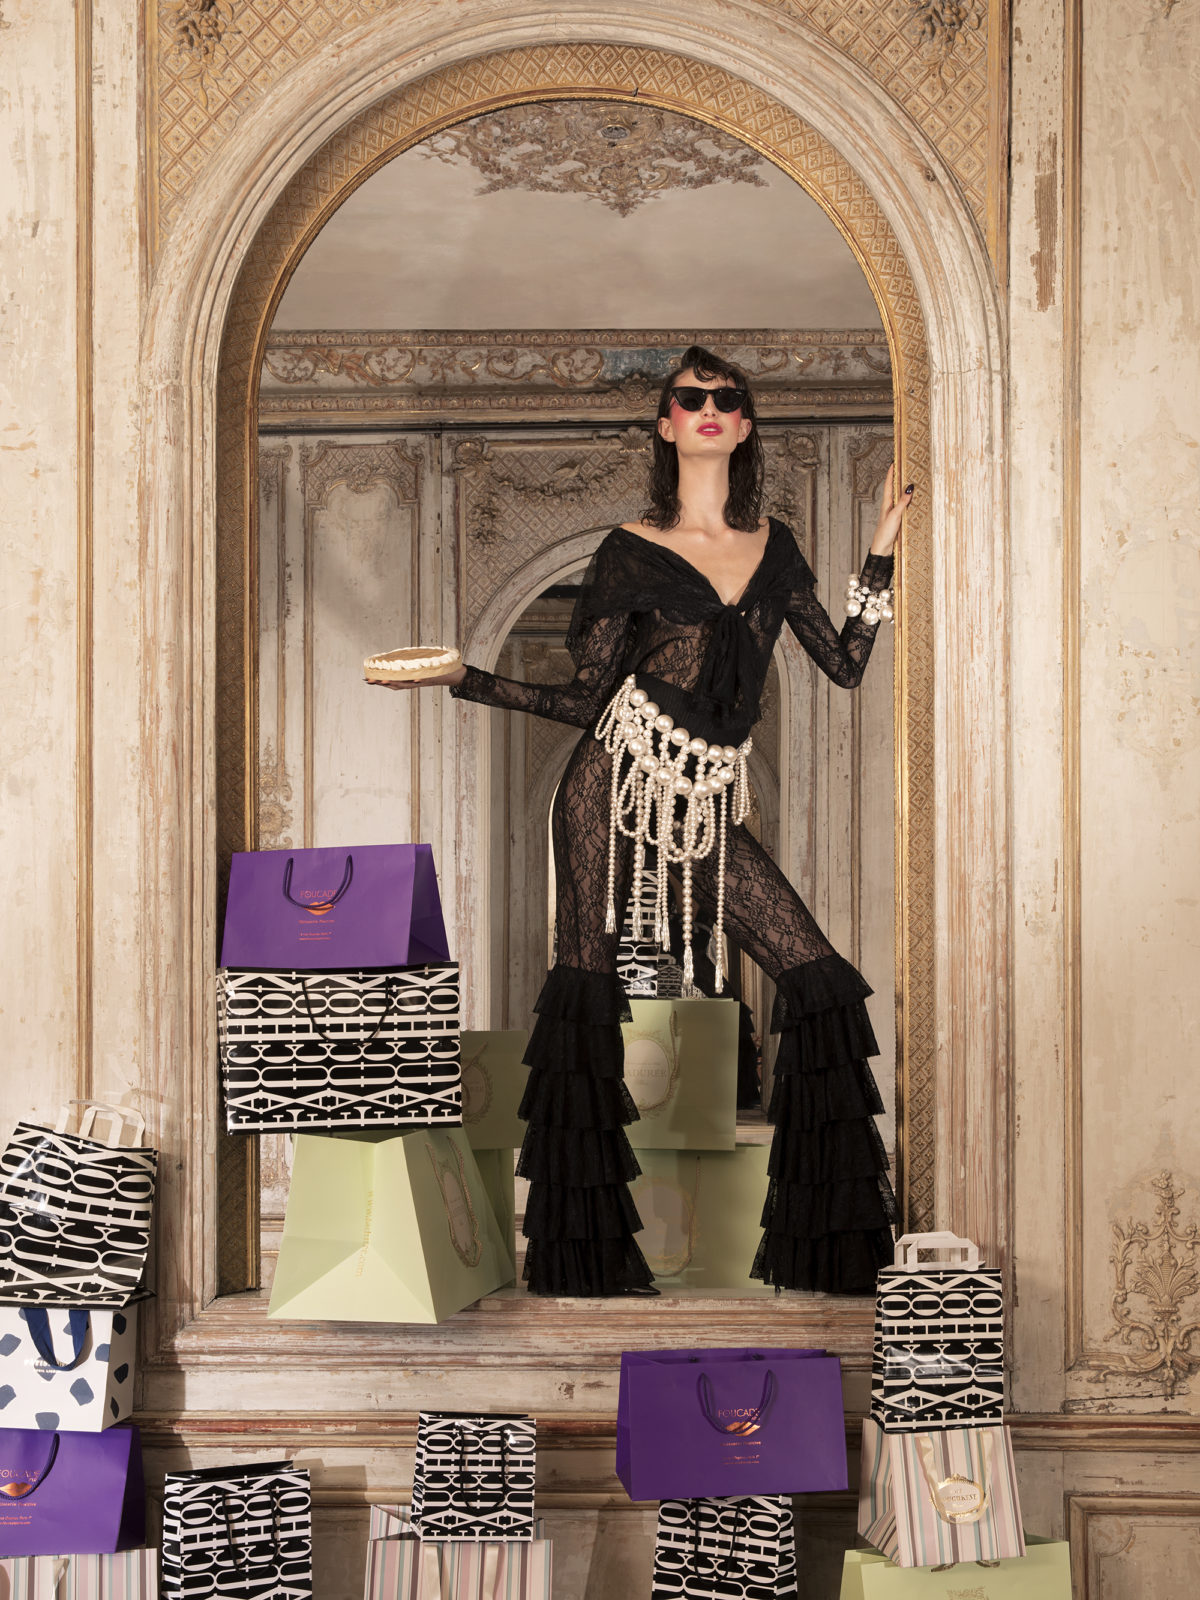 A NOUS PARIS shot by Calypso Mahieu styled by Arthur Mayadoux with Vogue, Faith Connexion, Superbe, Dior, Moy Paris